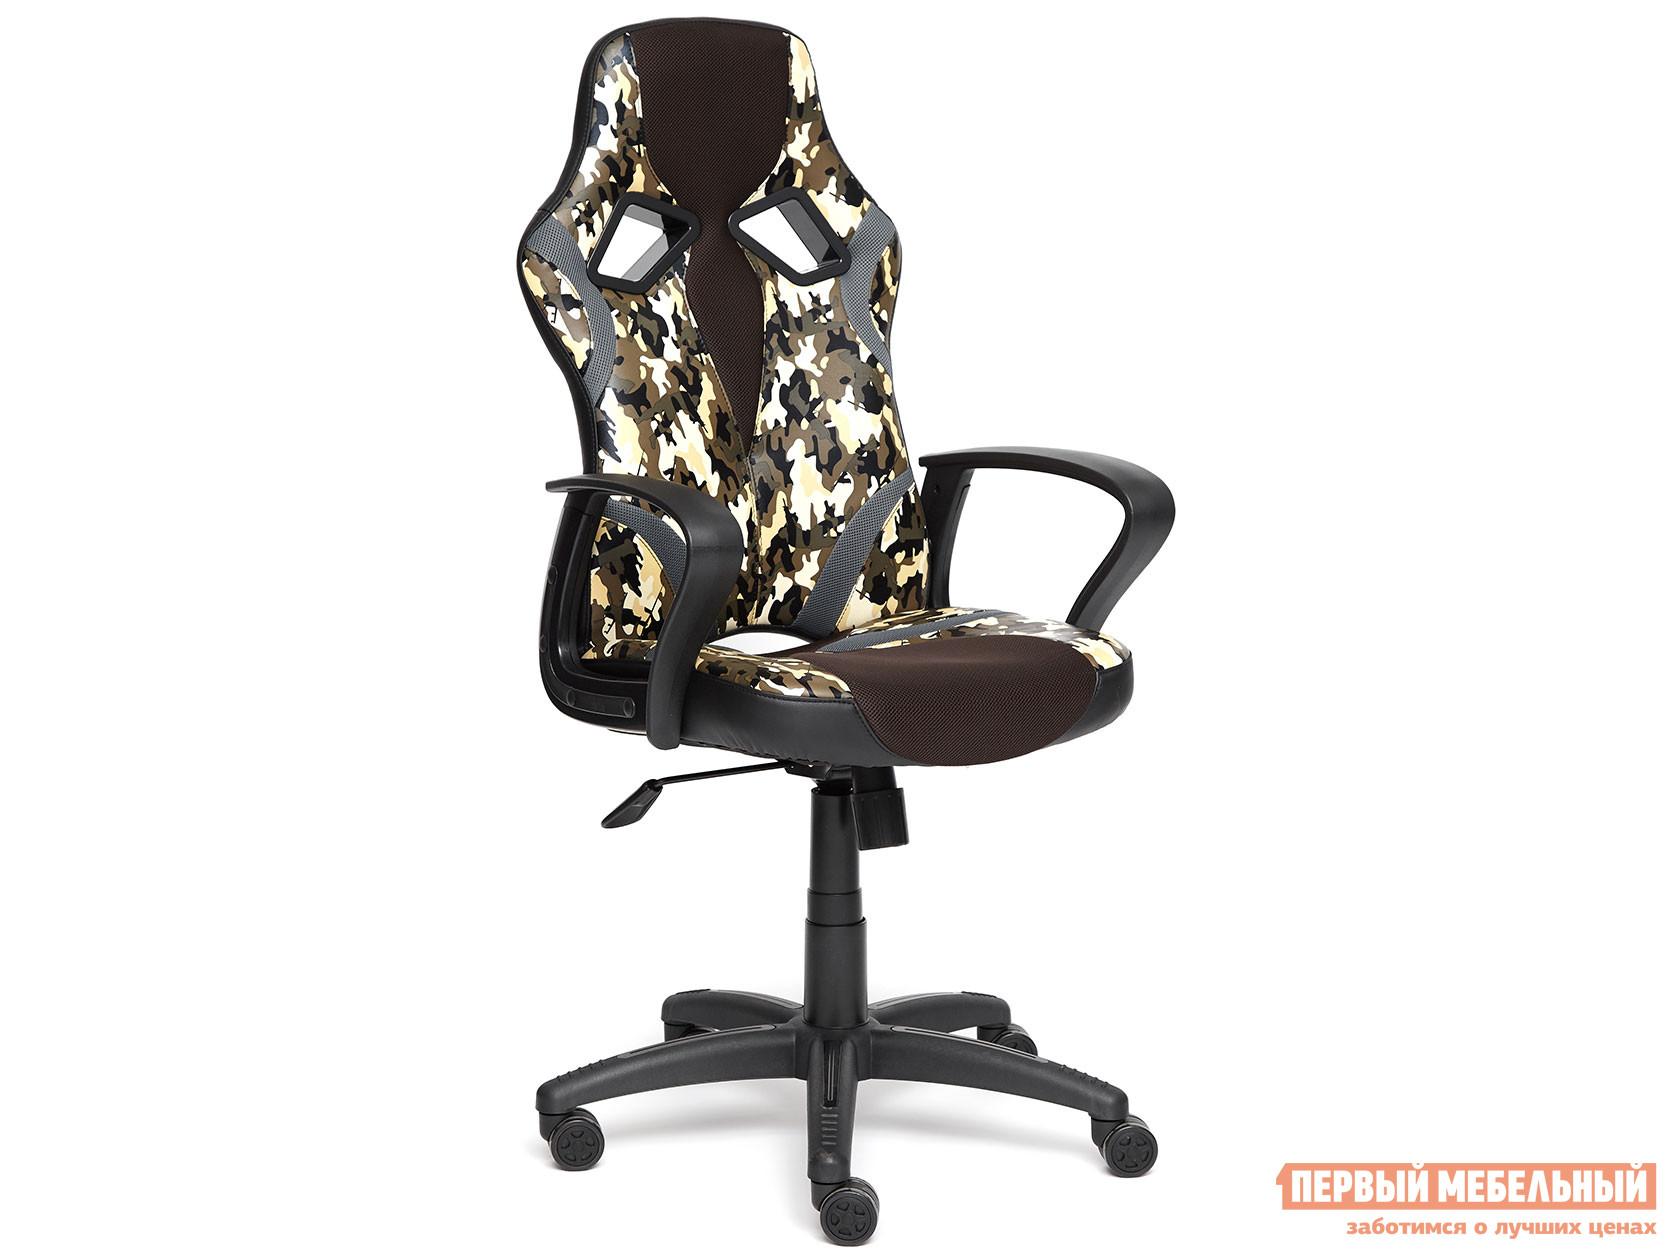 Офисное кресло Tetchair RUNNER military